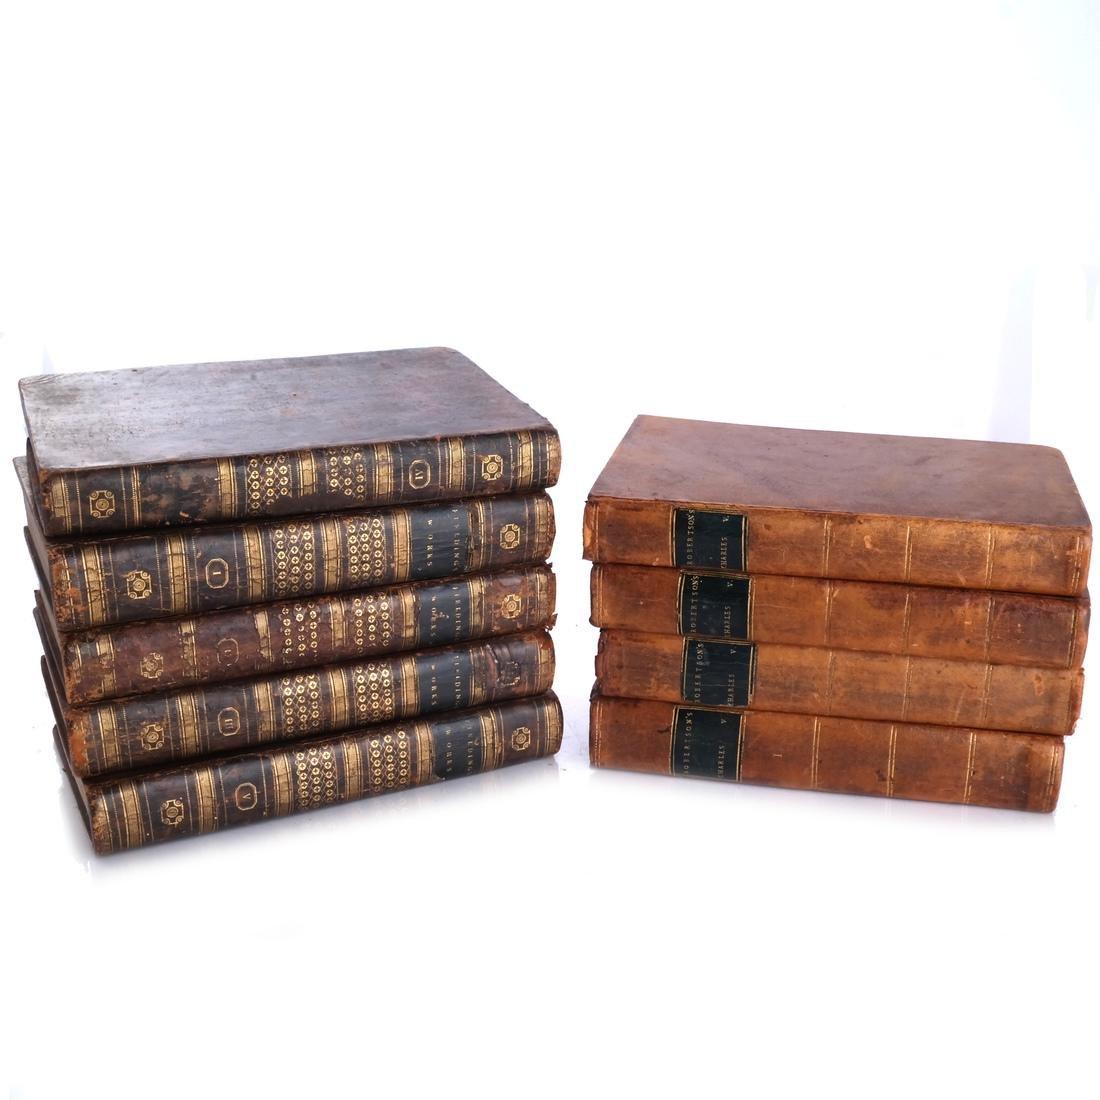 Books: 27+ Volumes - 5